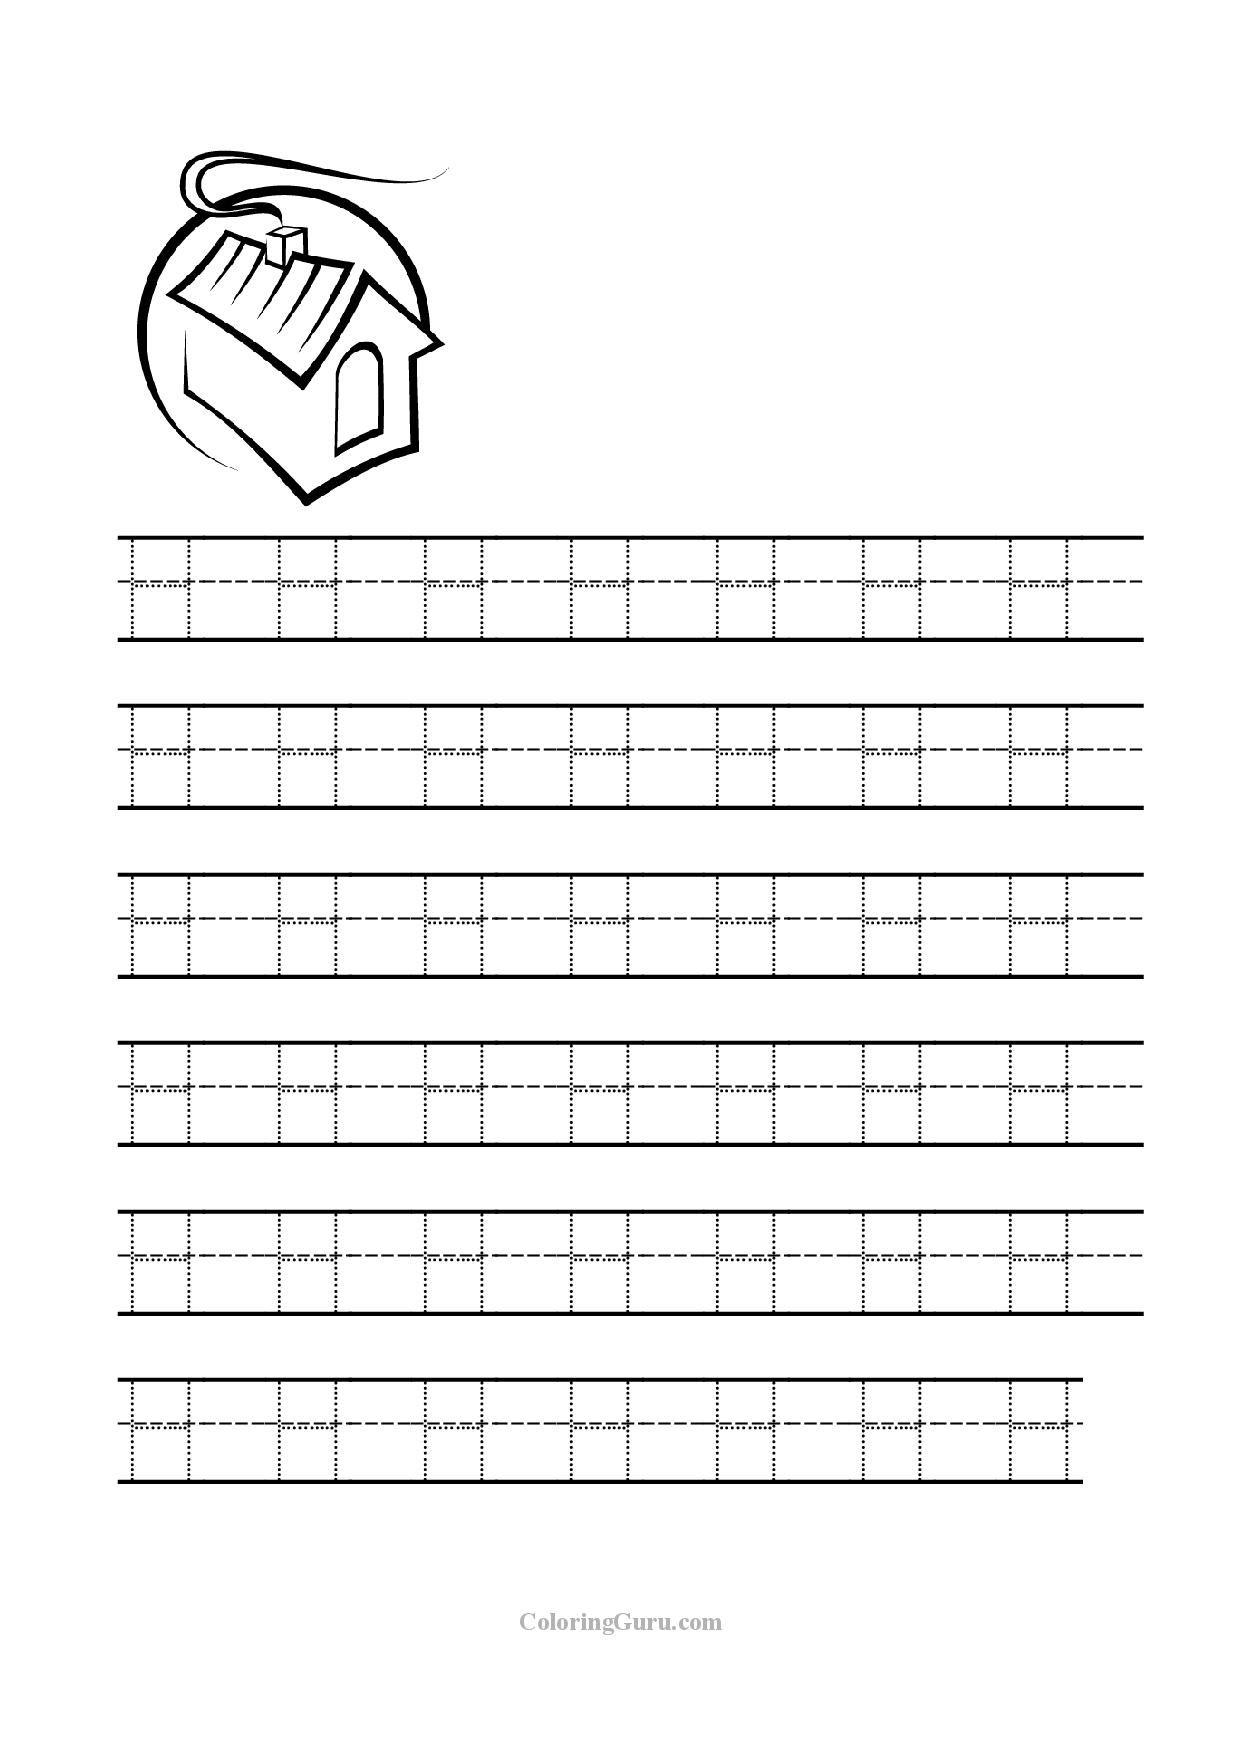 Letter H Tracing Worksheets Worksheets For All | Tracing with regard to Tracing Letter H Worksheets Preschoolers